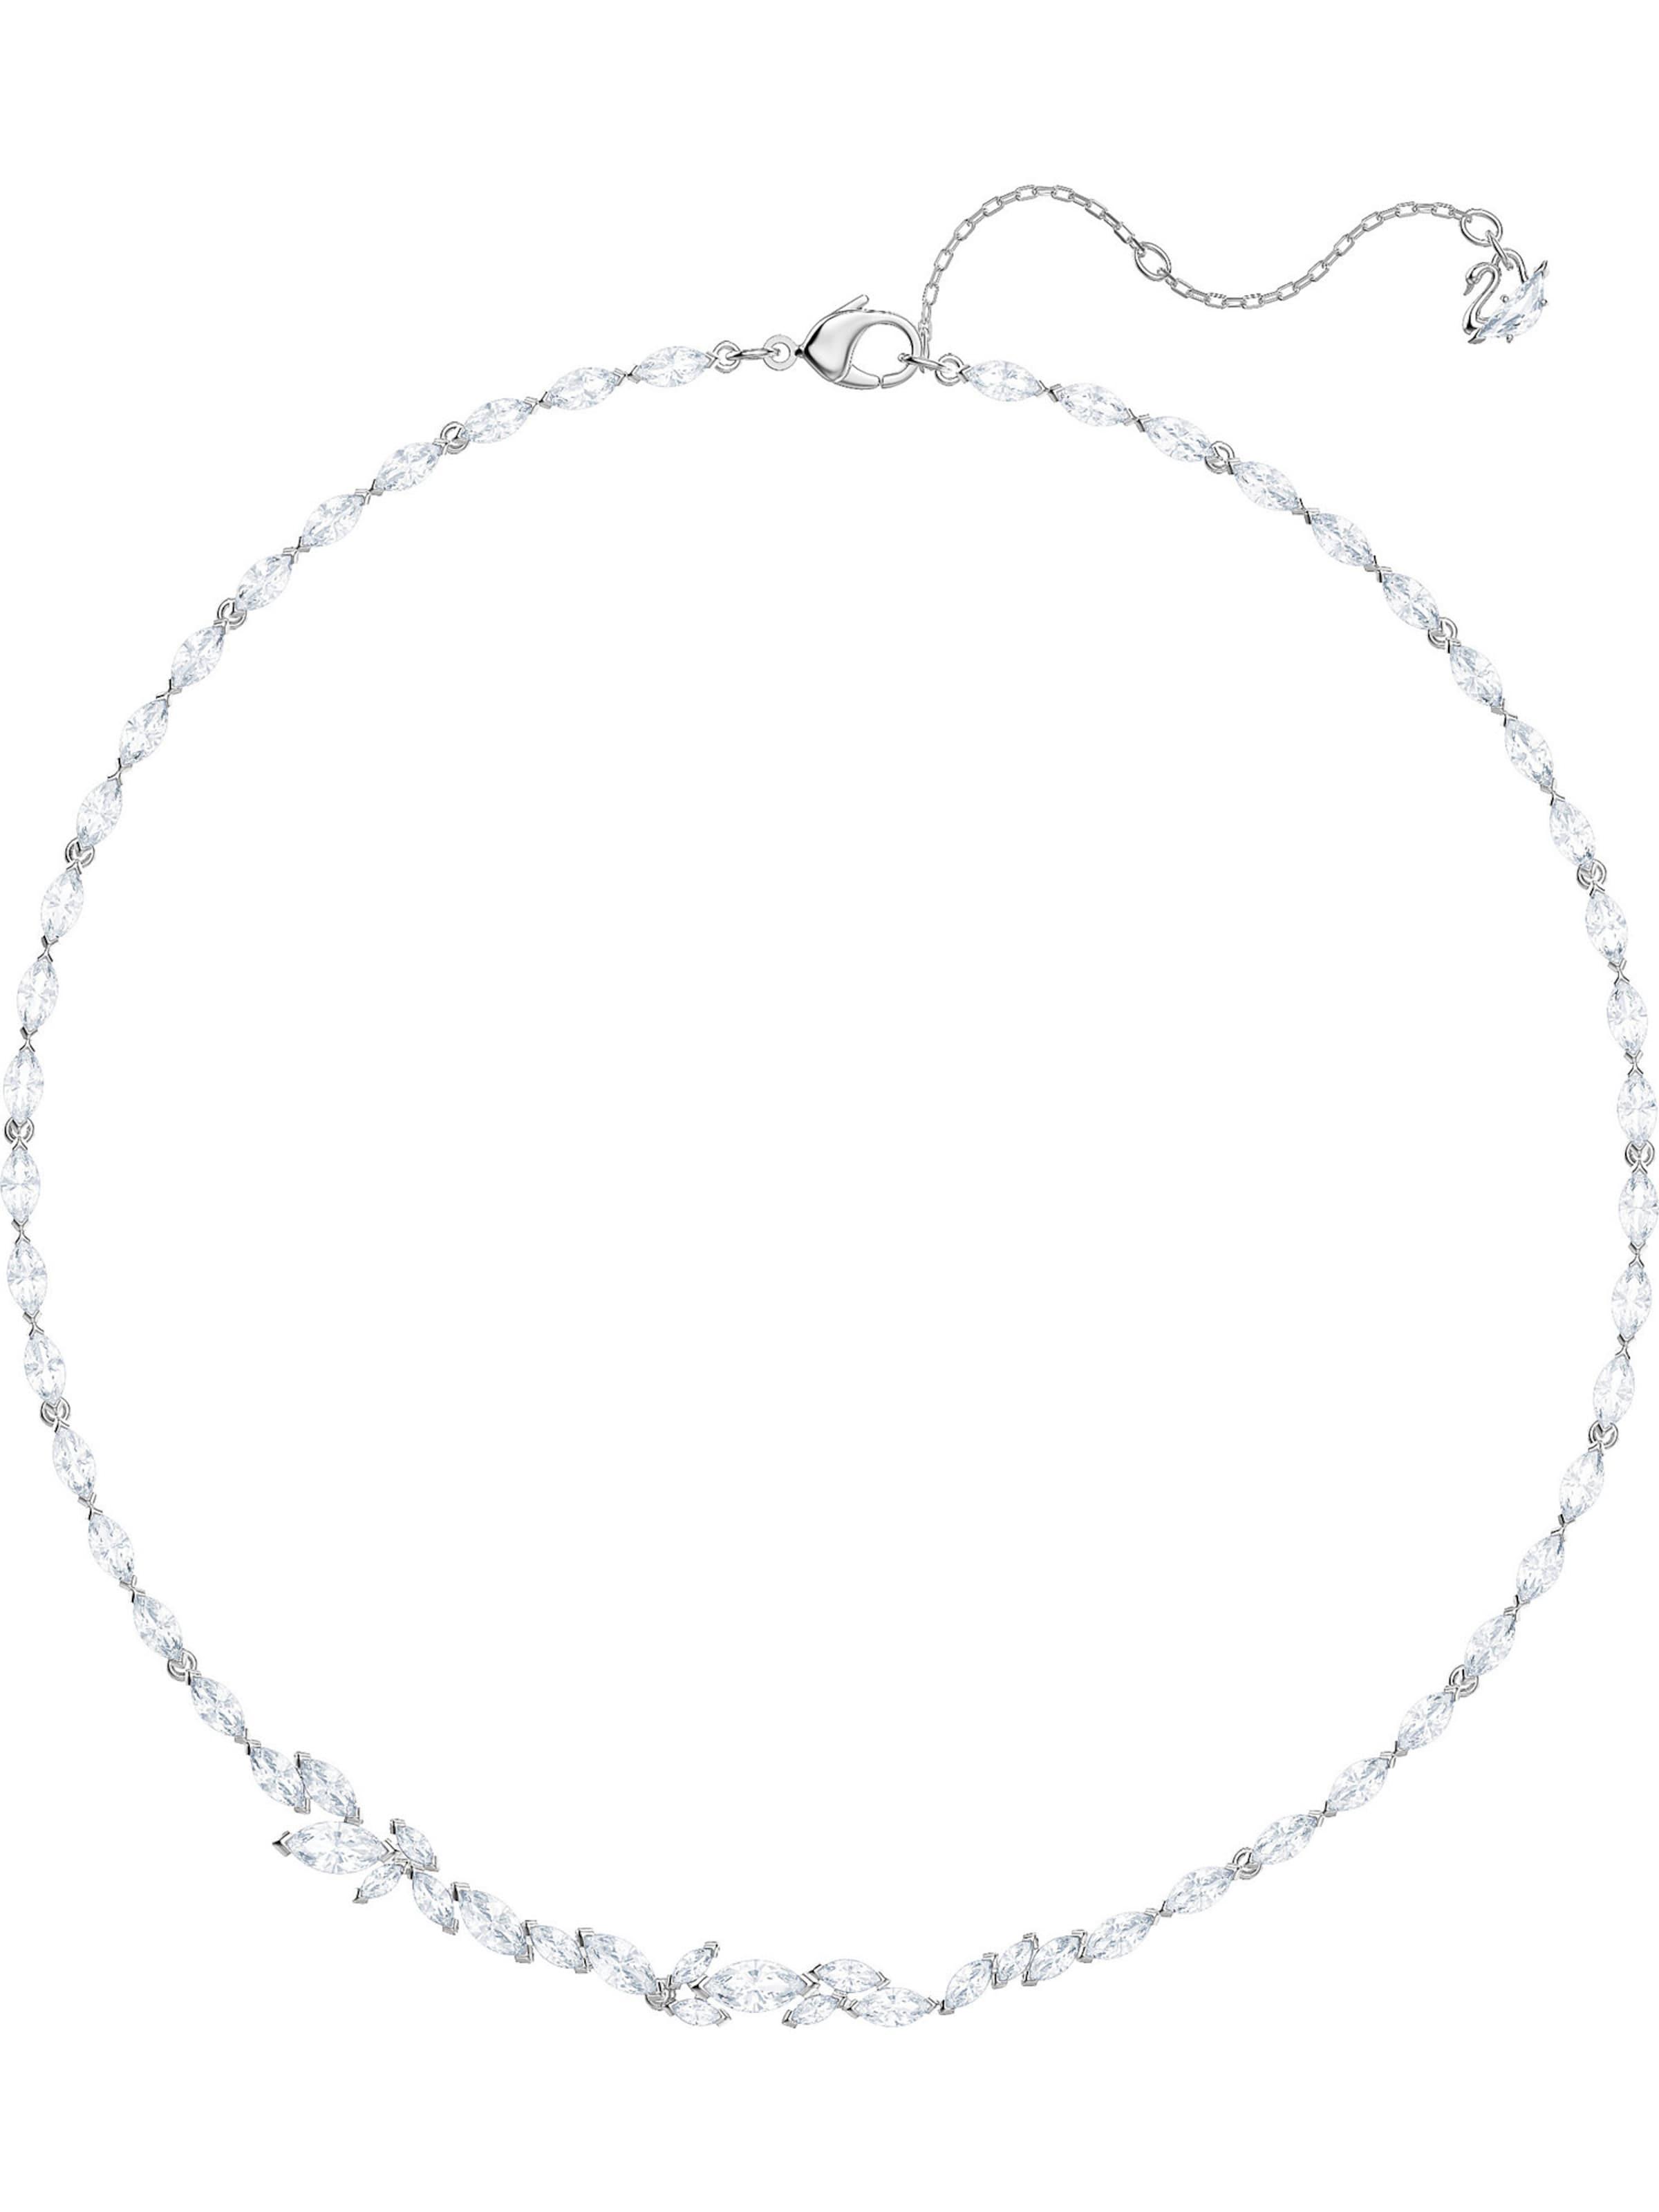 Kette Swarovski 'louison' Silber Swarovski In vmNw8On0